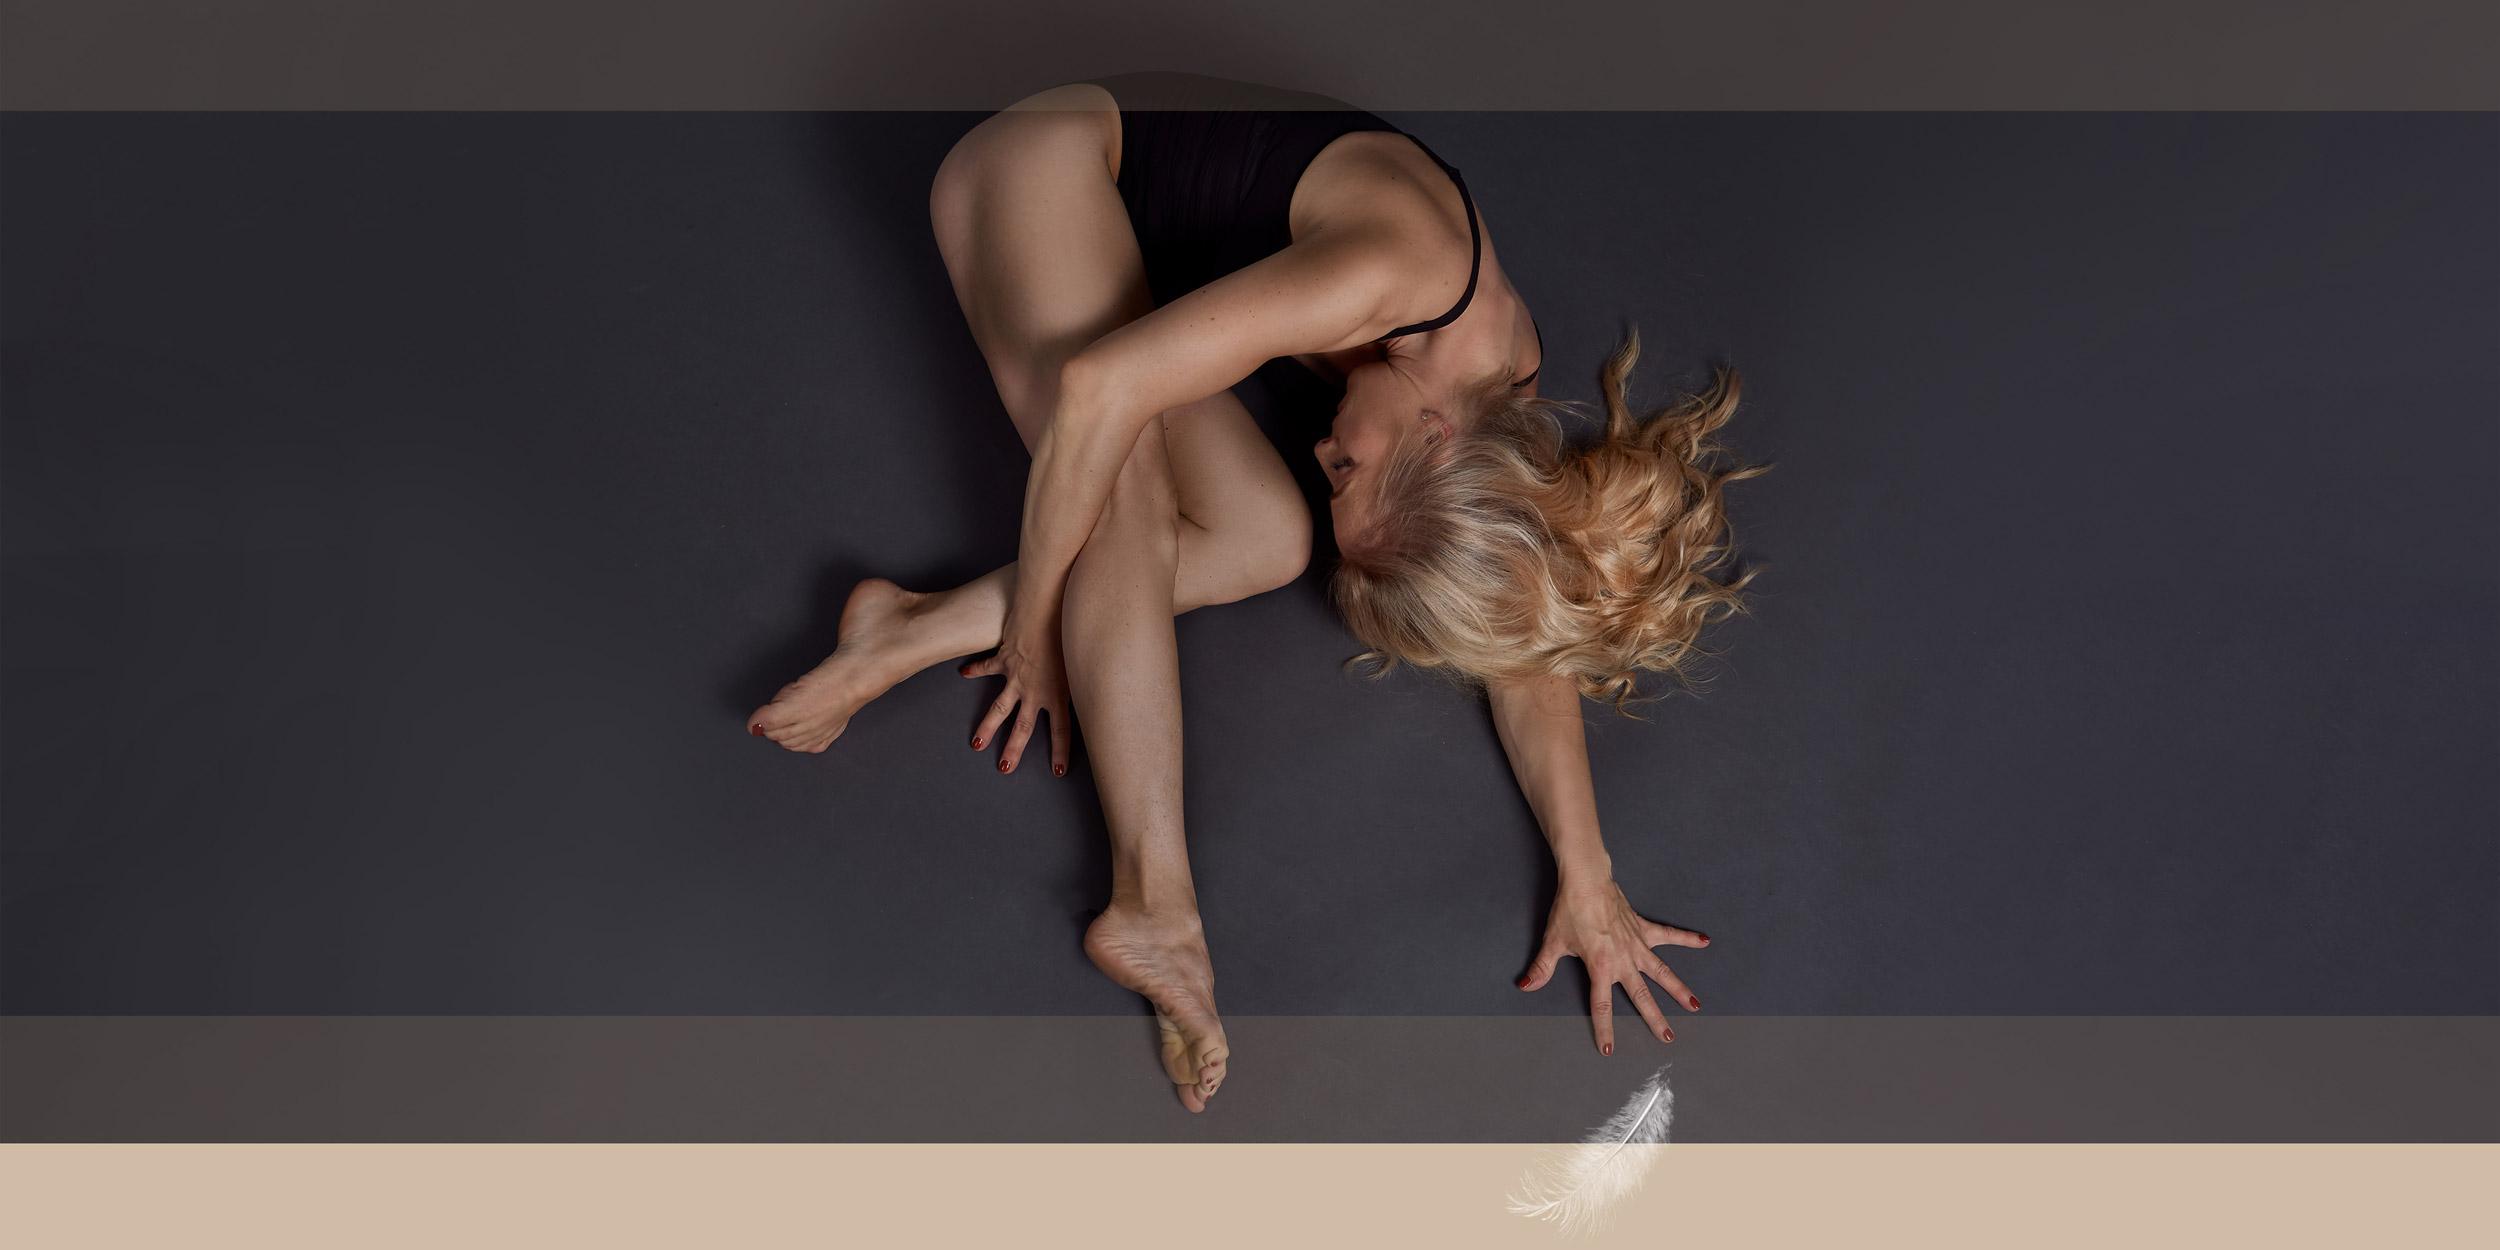 Pole Dance Trainerin - Figur liegend